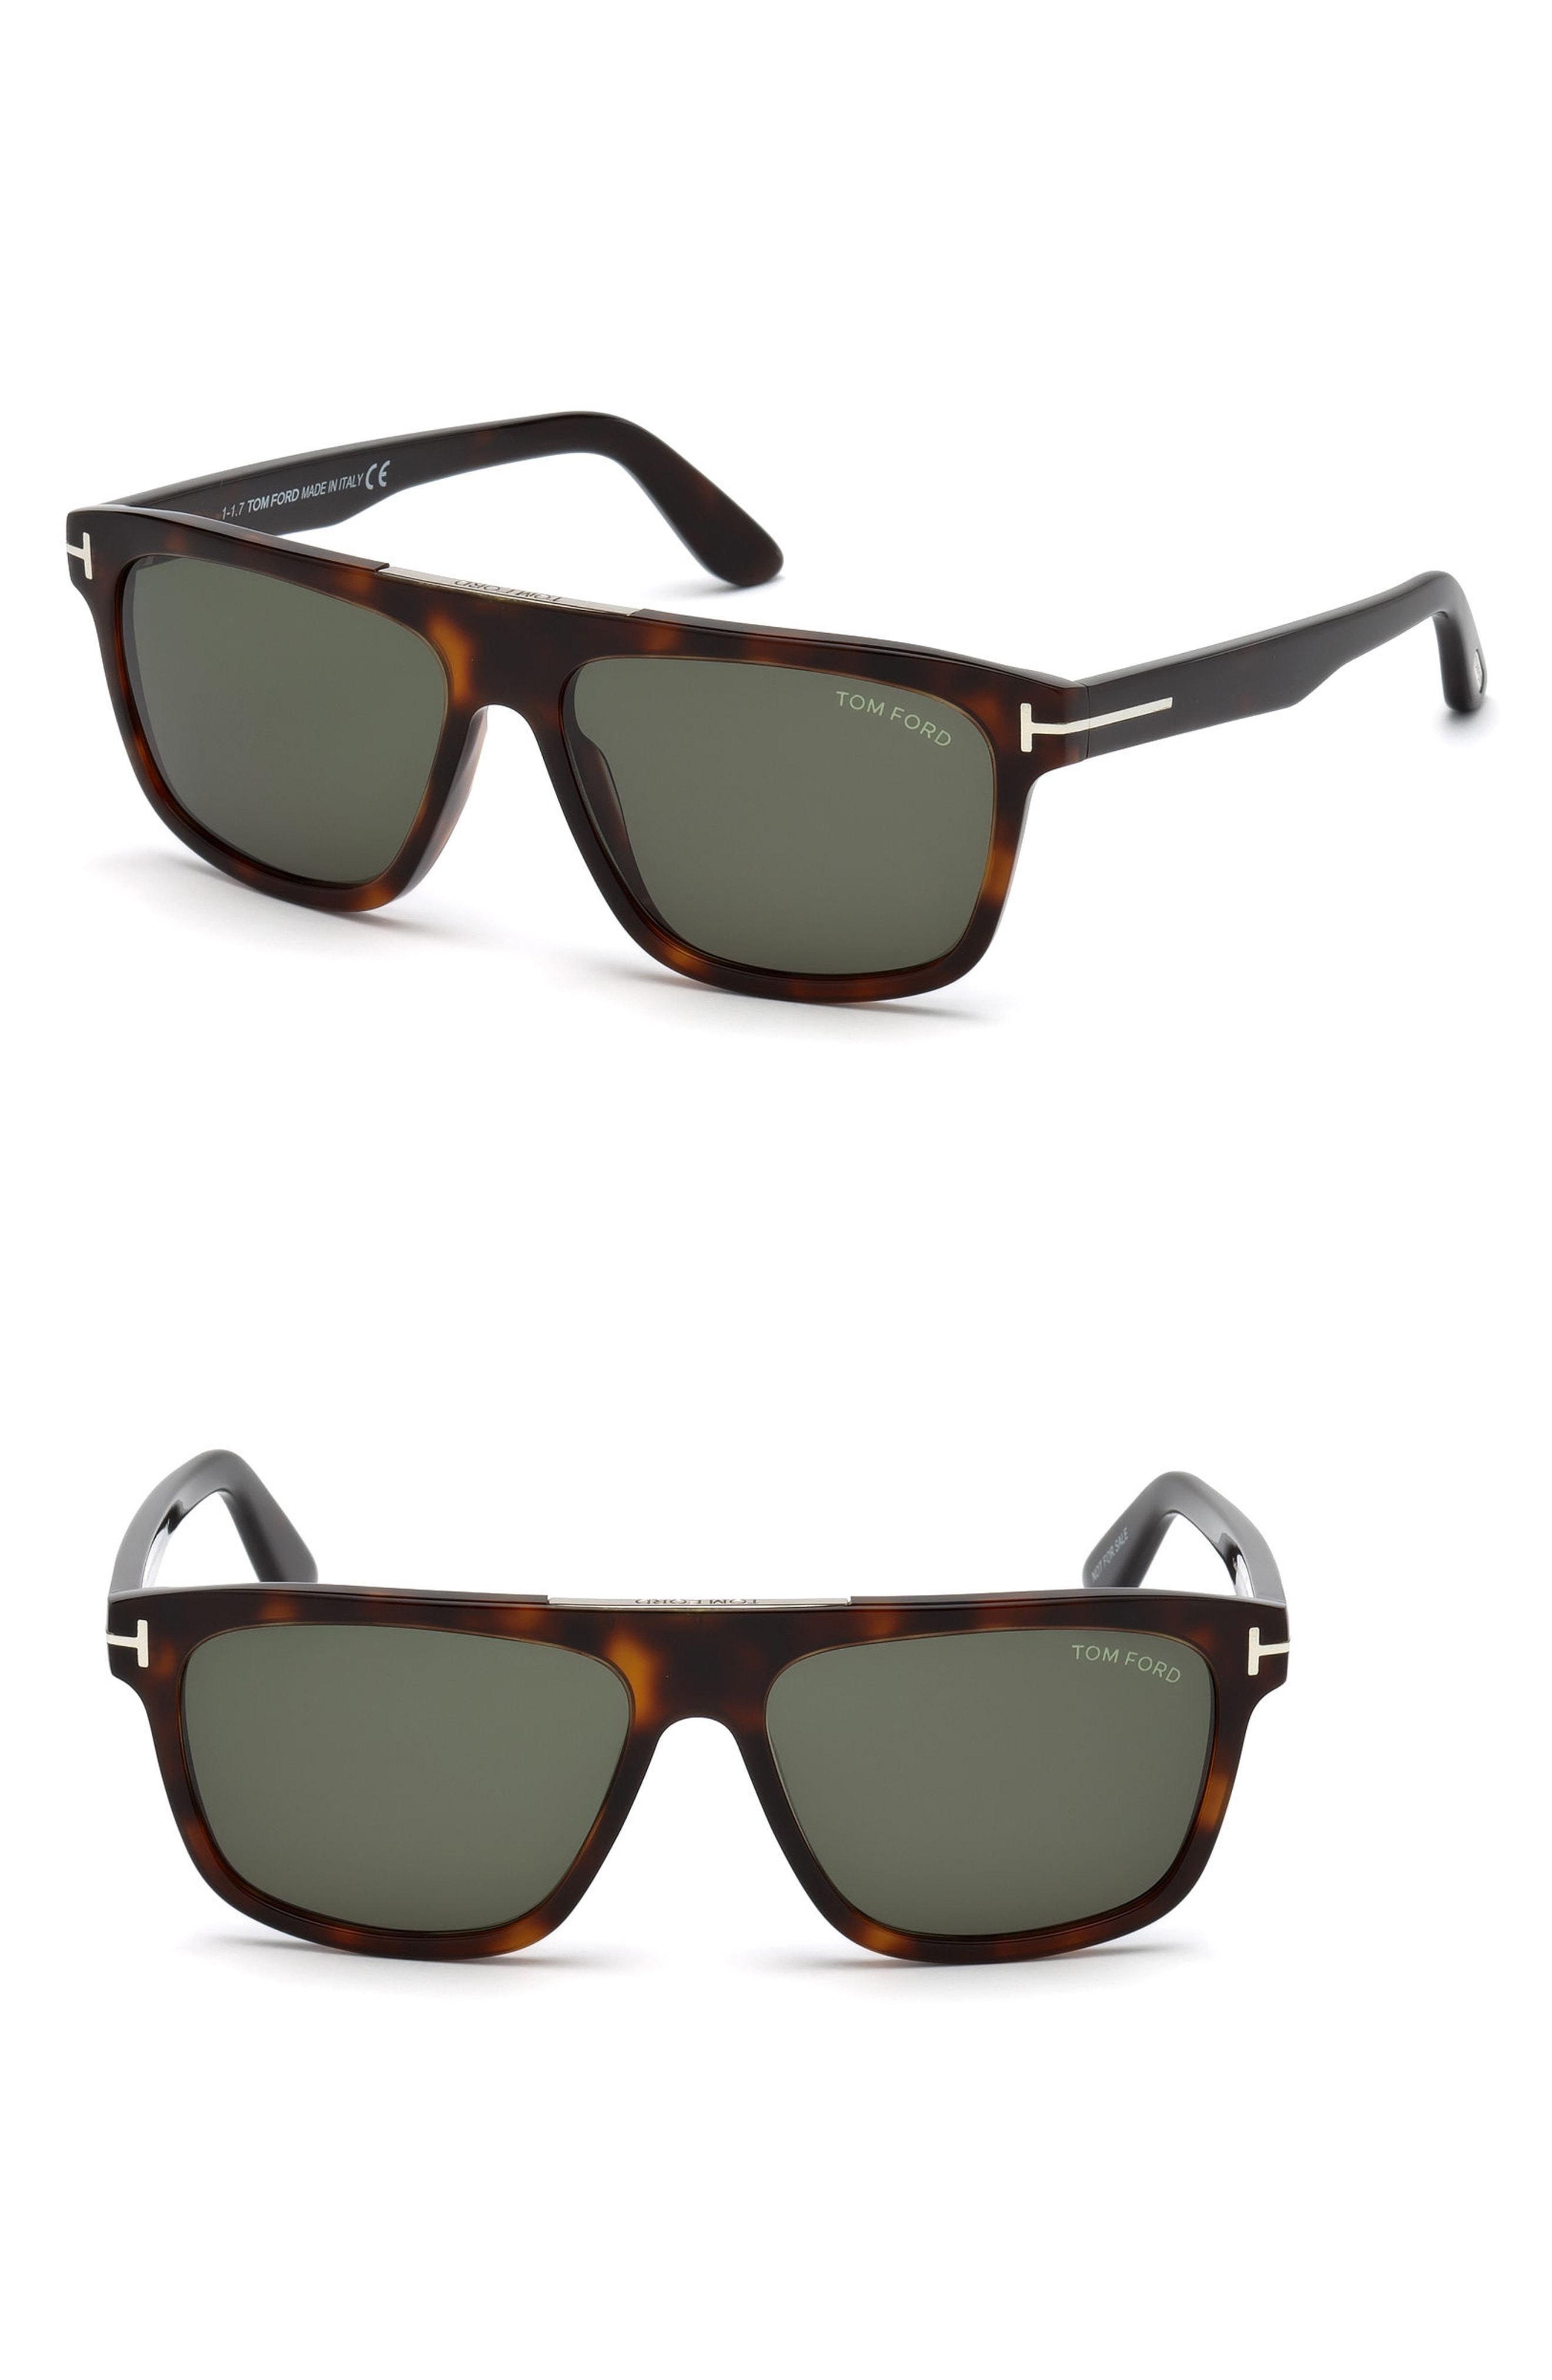 beb295394115 Tom Ford - Cecilio 57mm Sunglasses - Dark Havana   Green for Men - Lyst.  View fullscreen